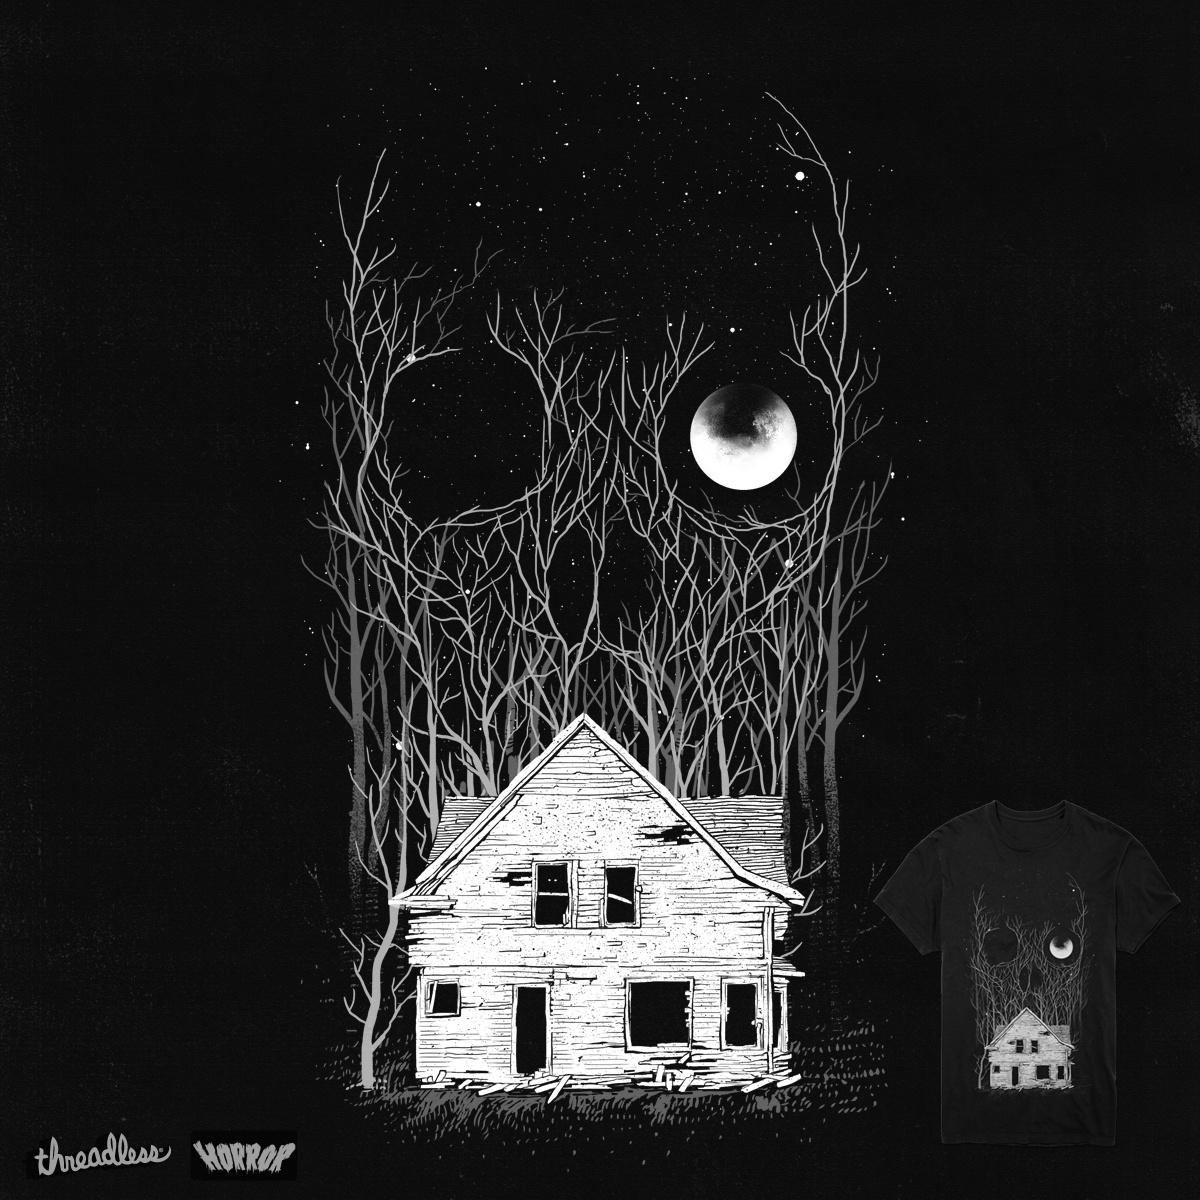 House of Death by digitalcarbine on Threadless